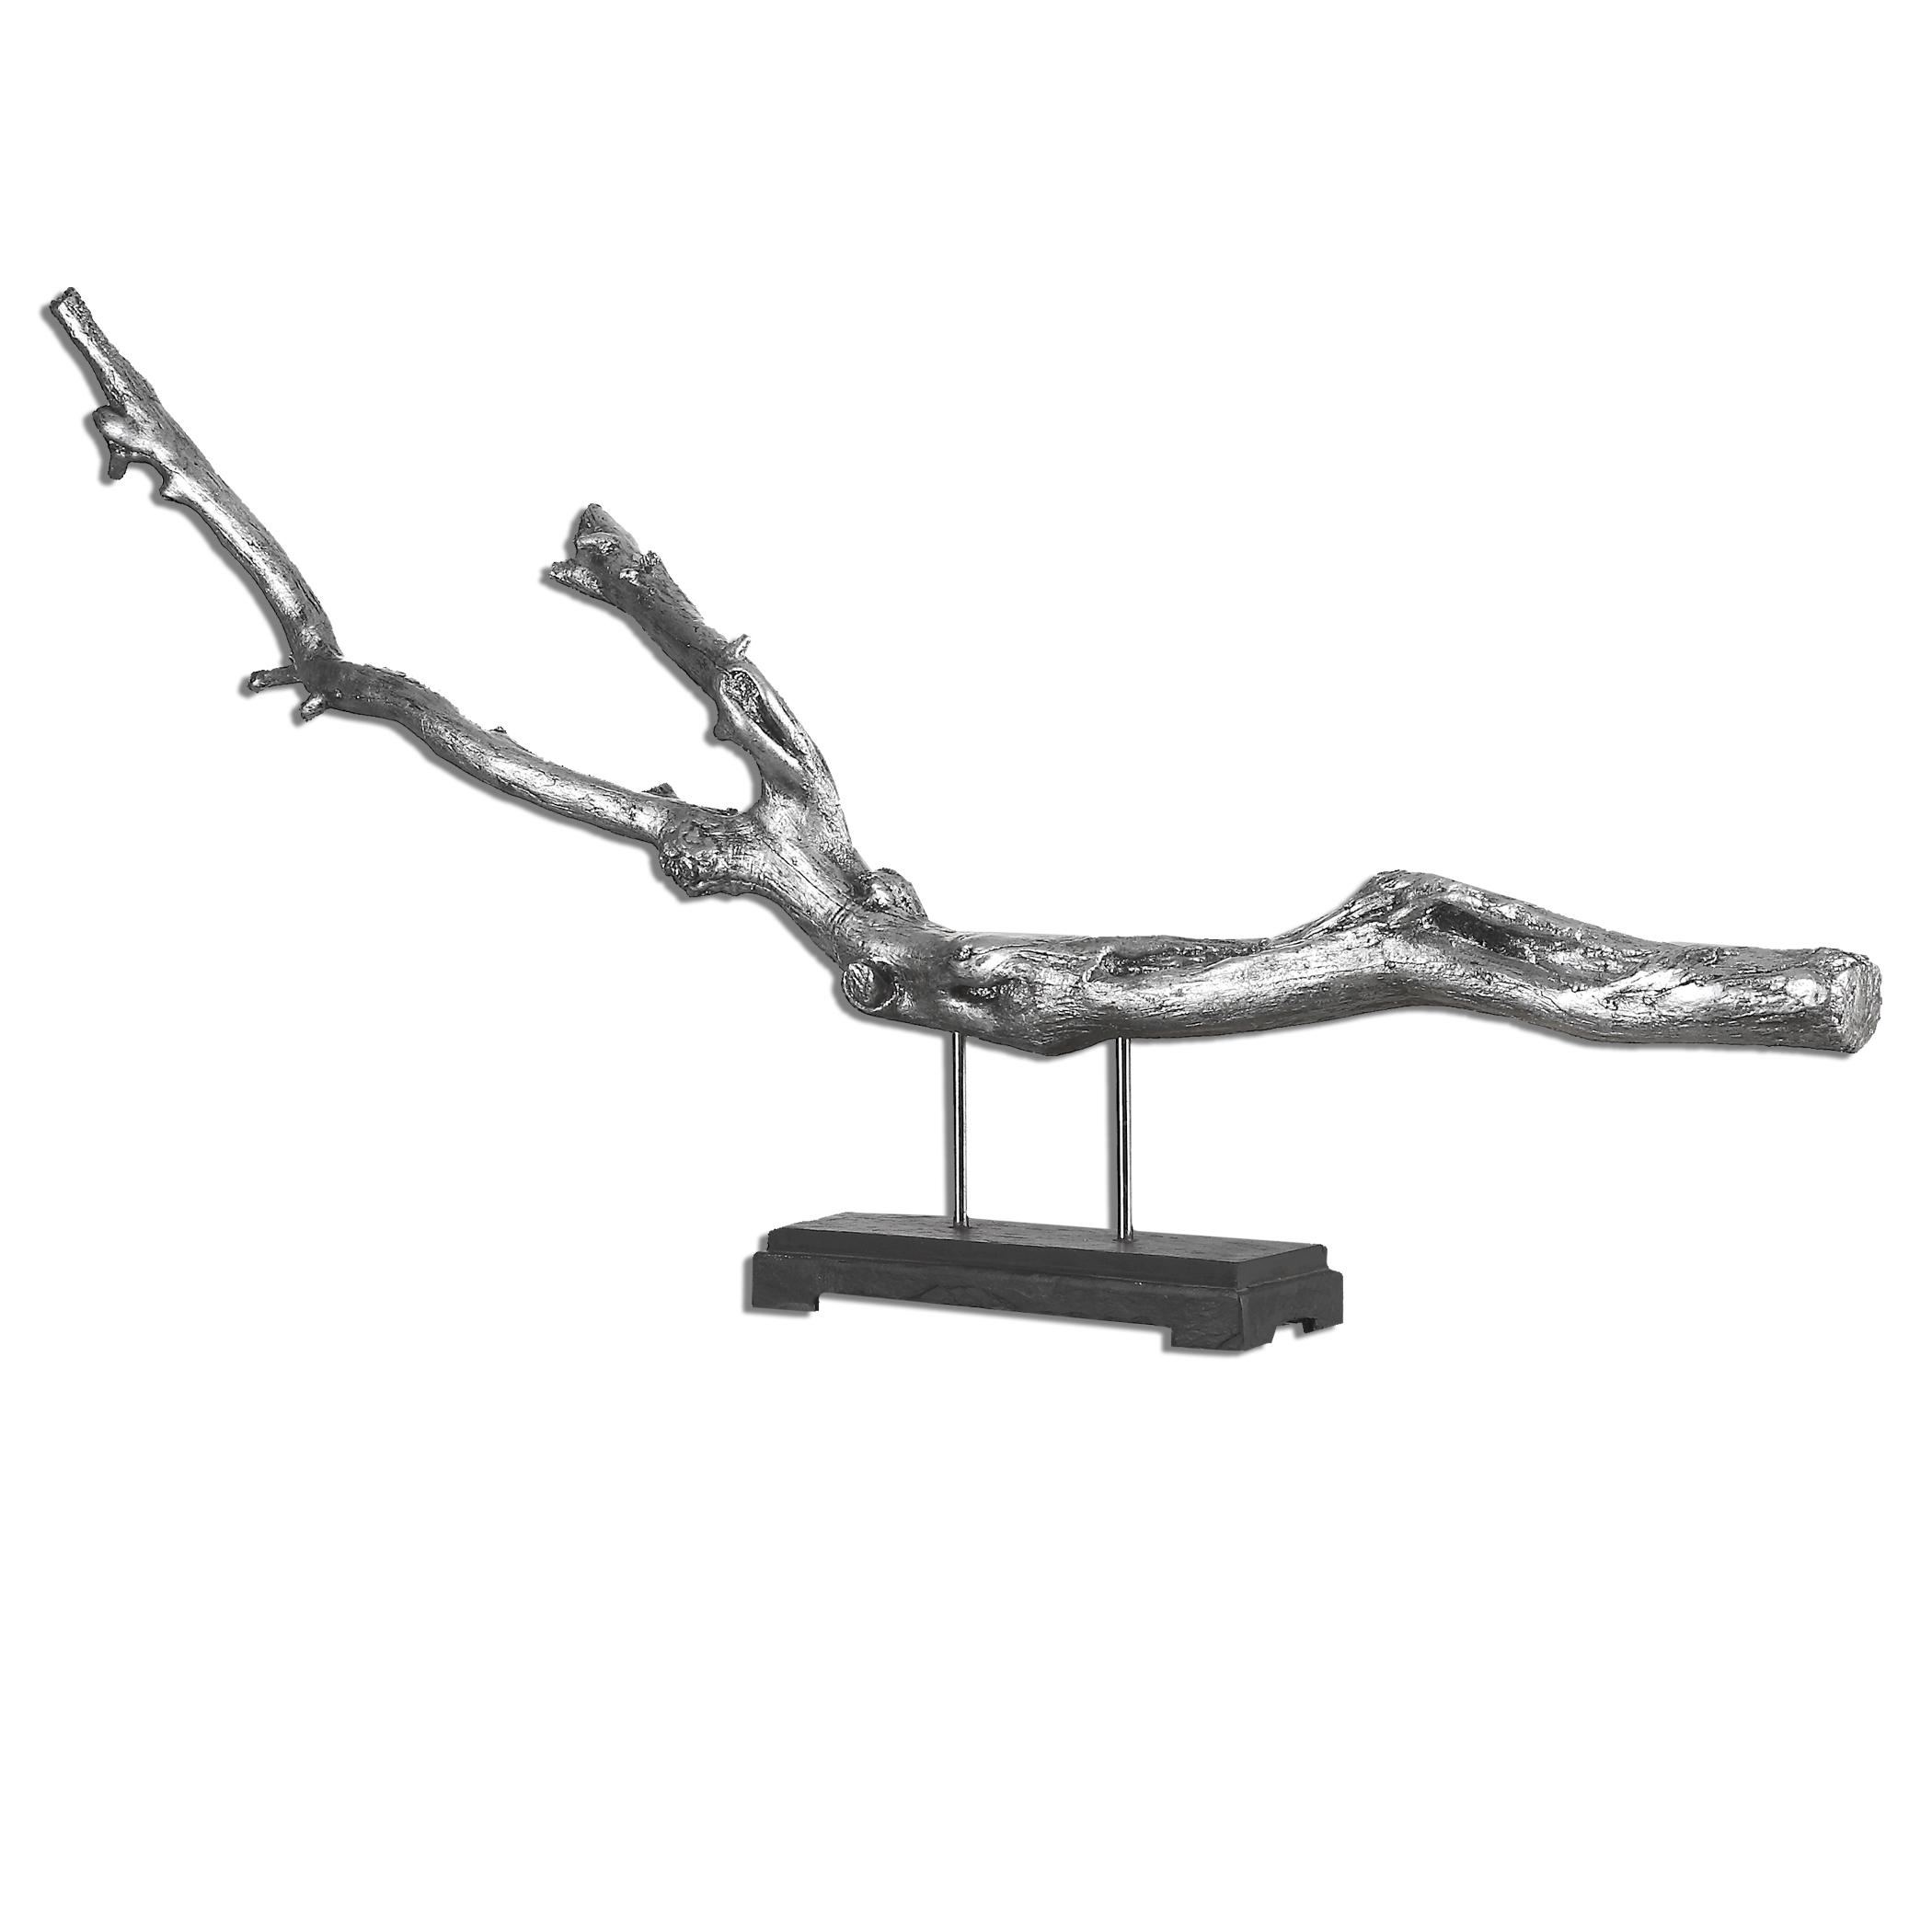 Uttermost Accessories Becan Driftwood Sculpture - Item Number: 20023